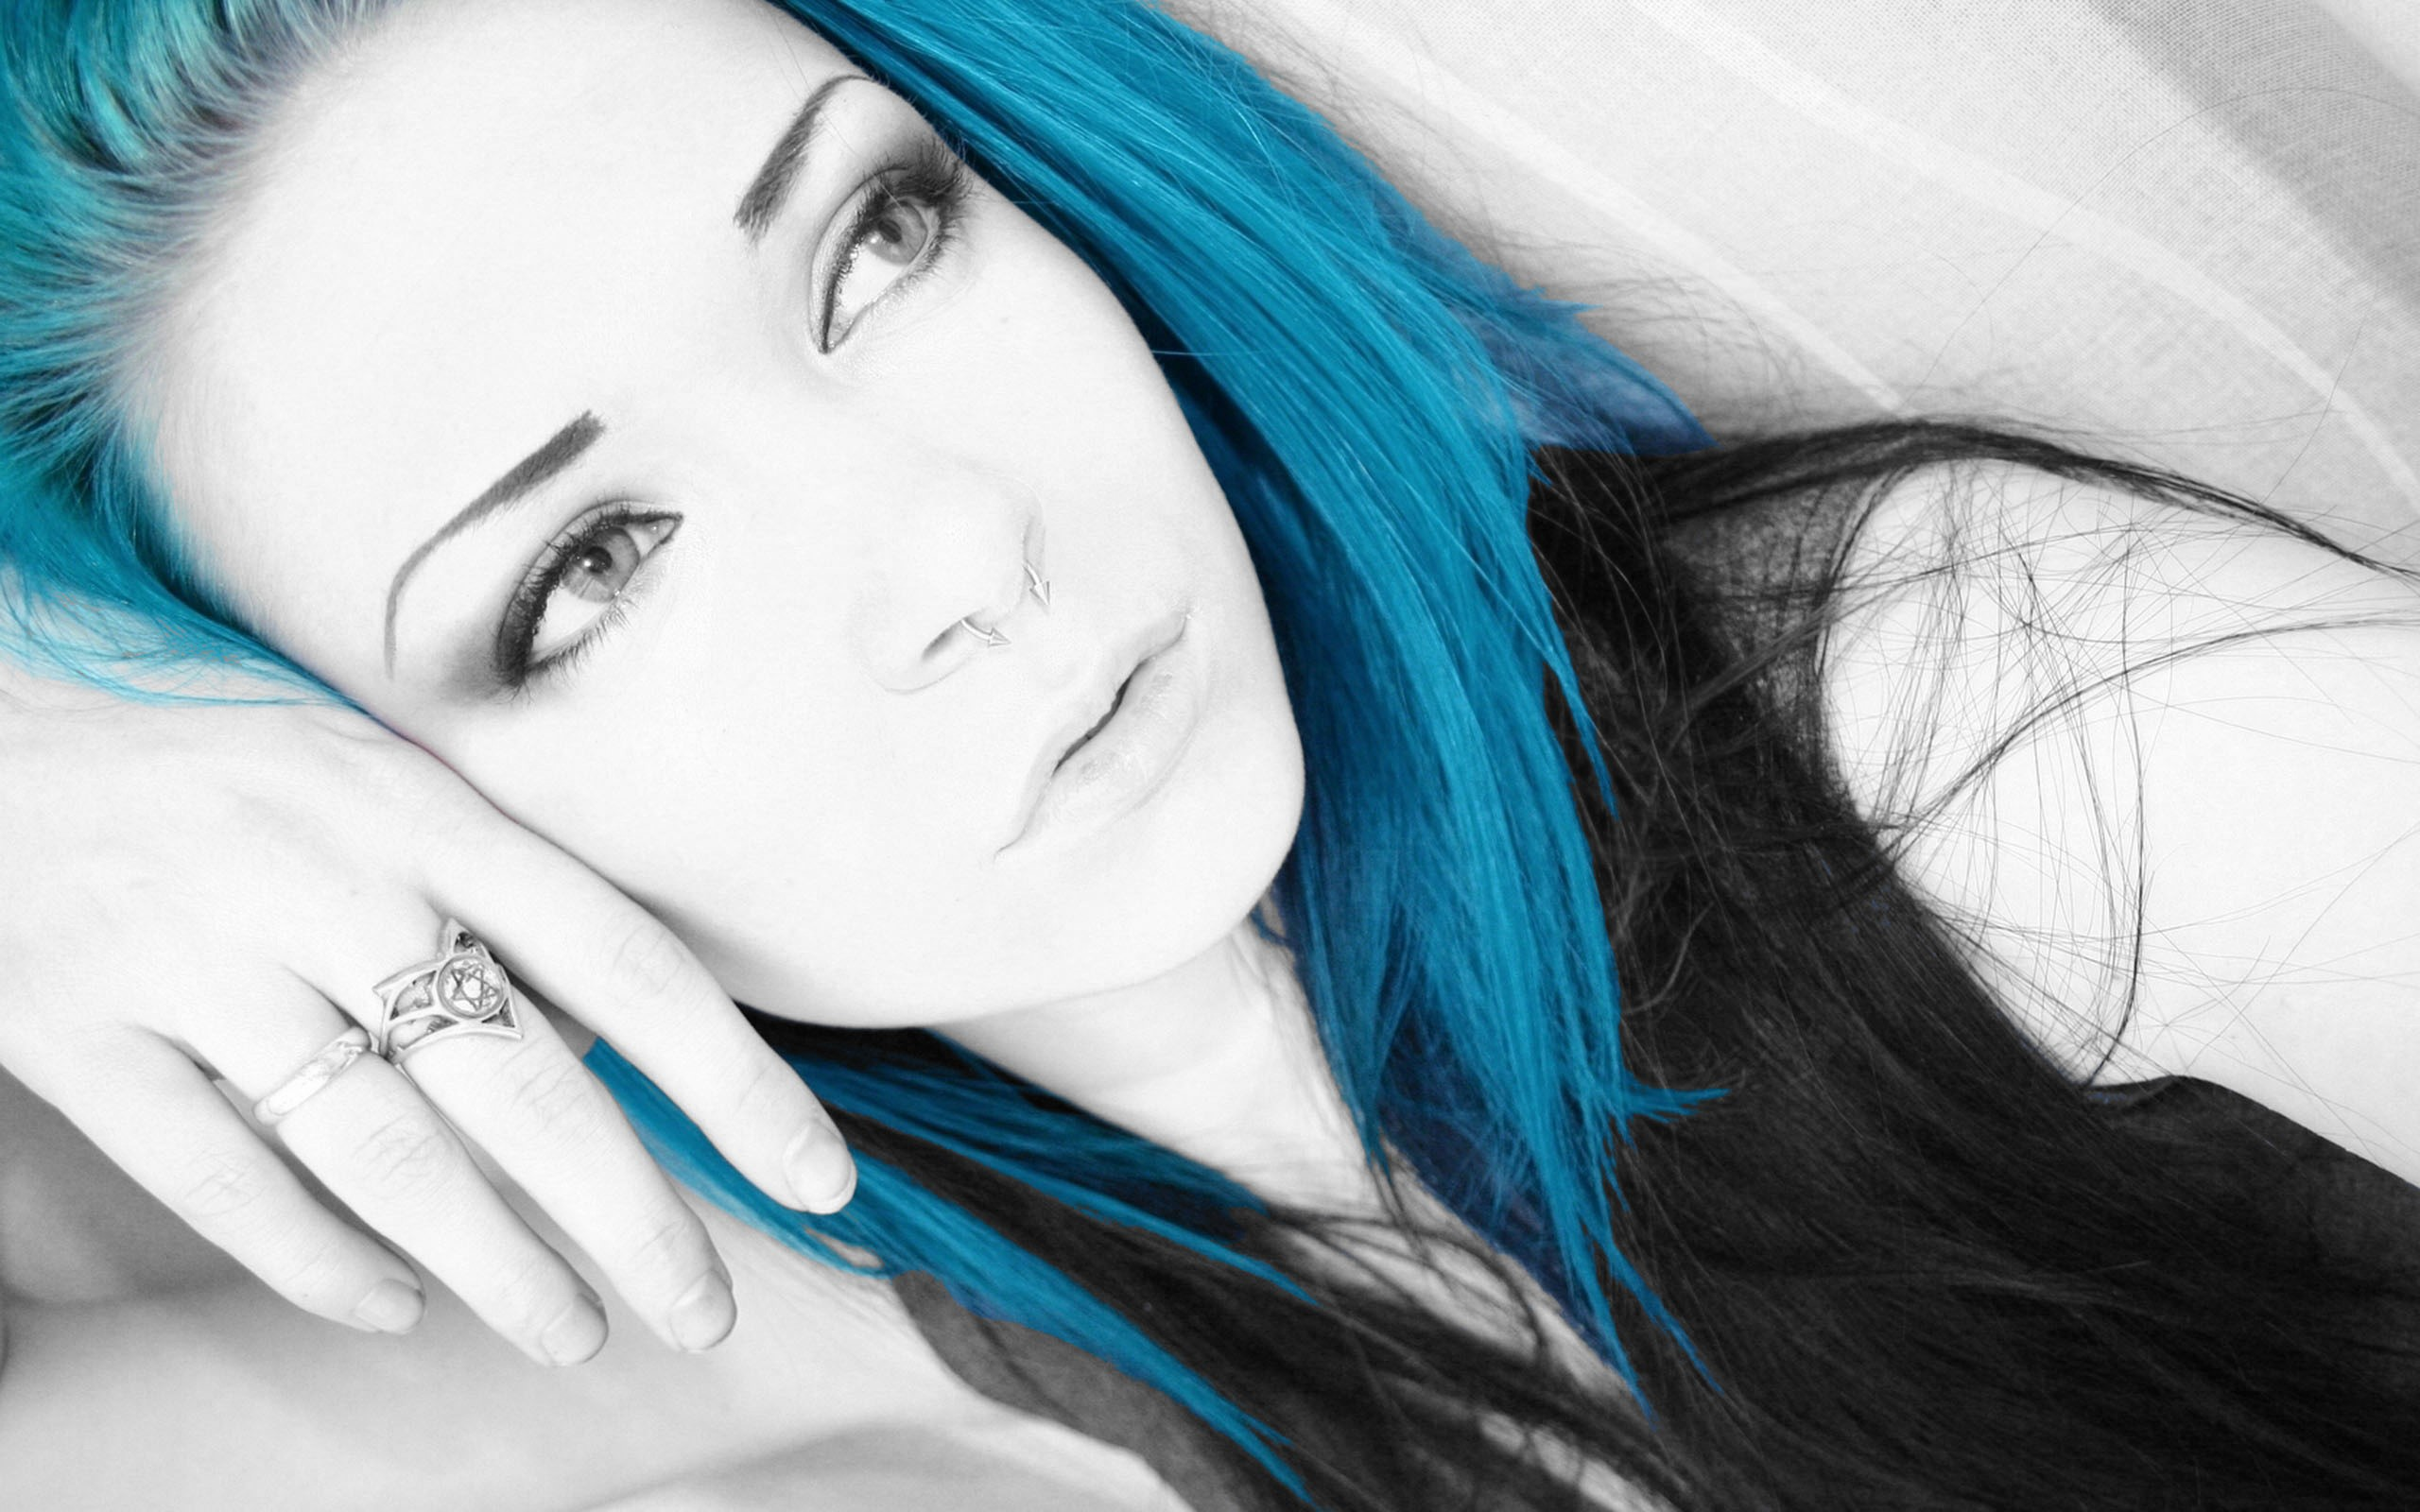 эмо девушки с синими волосами фото